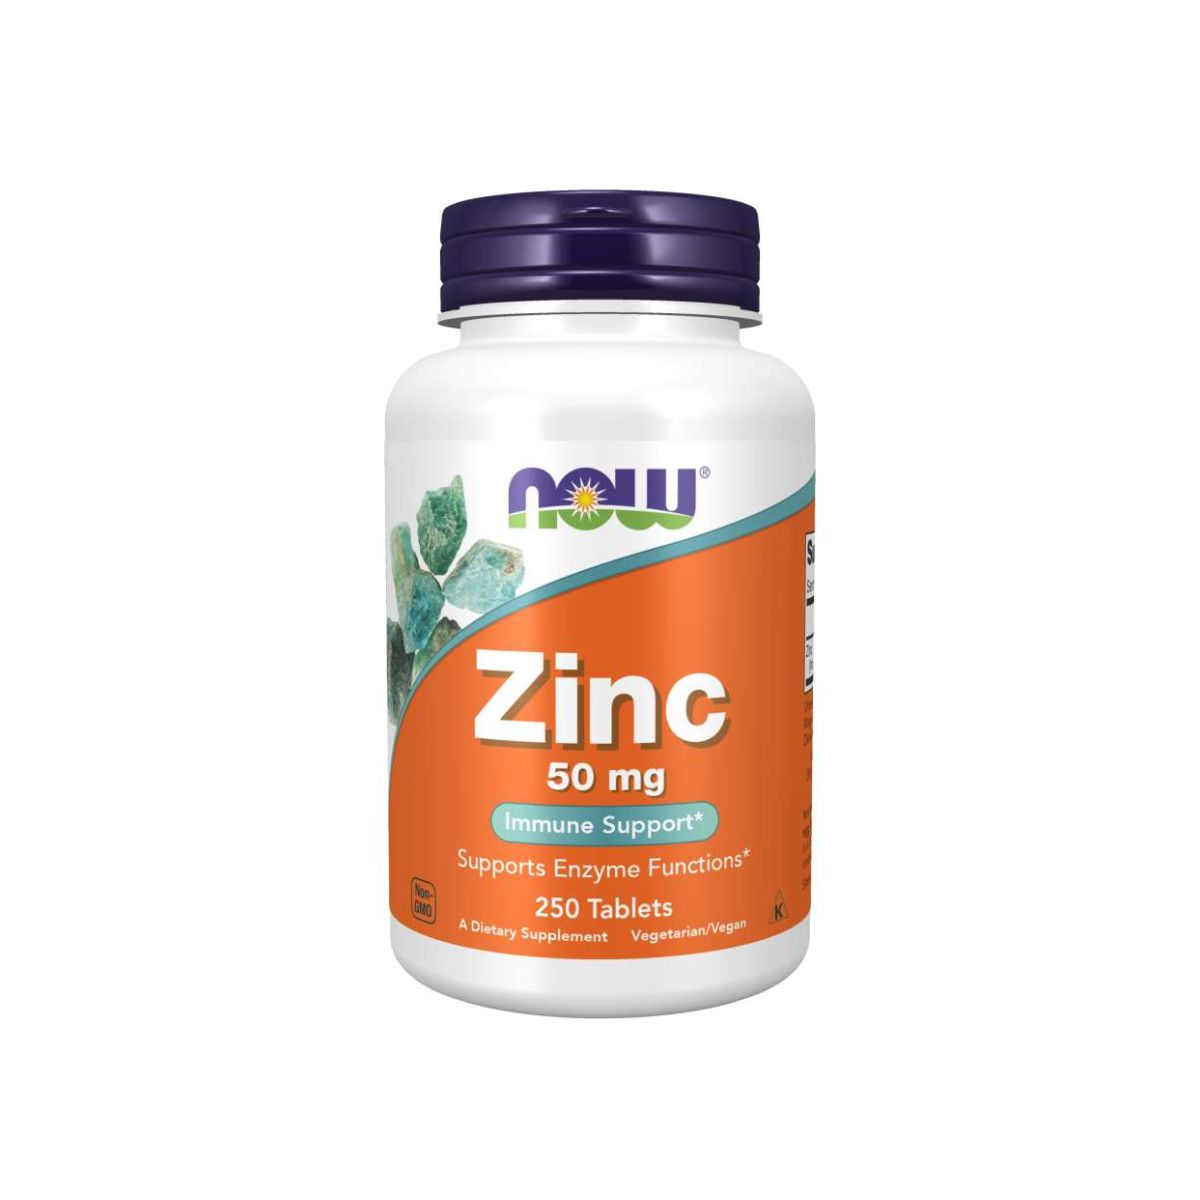 Zinc 50mg Immune Support 250Caps - Now Foods